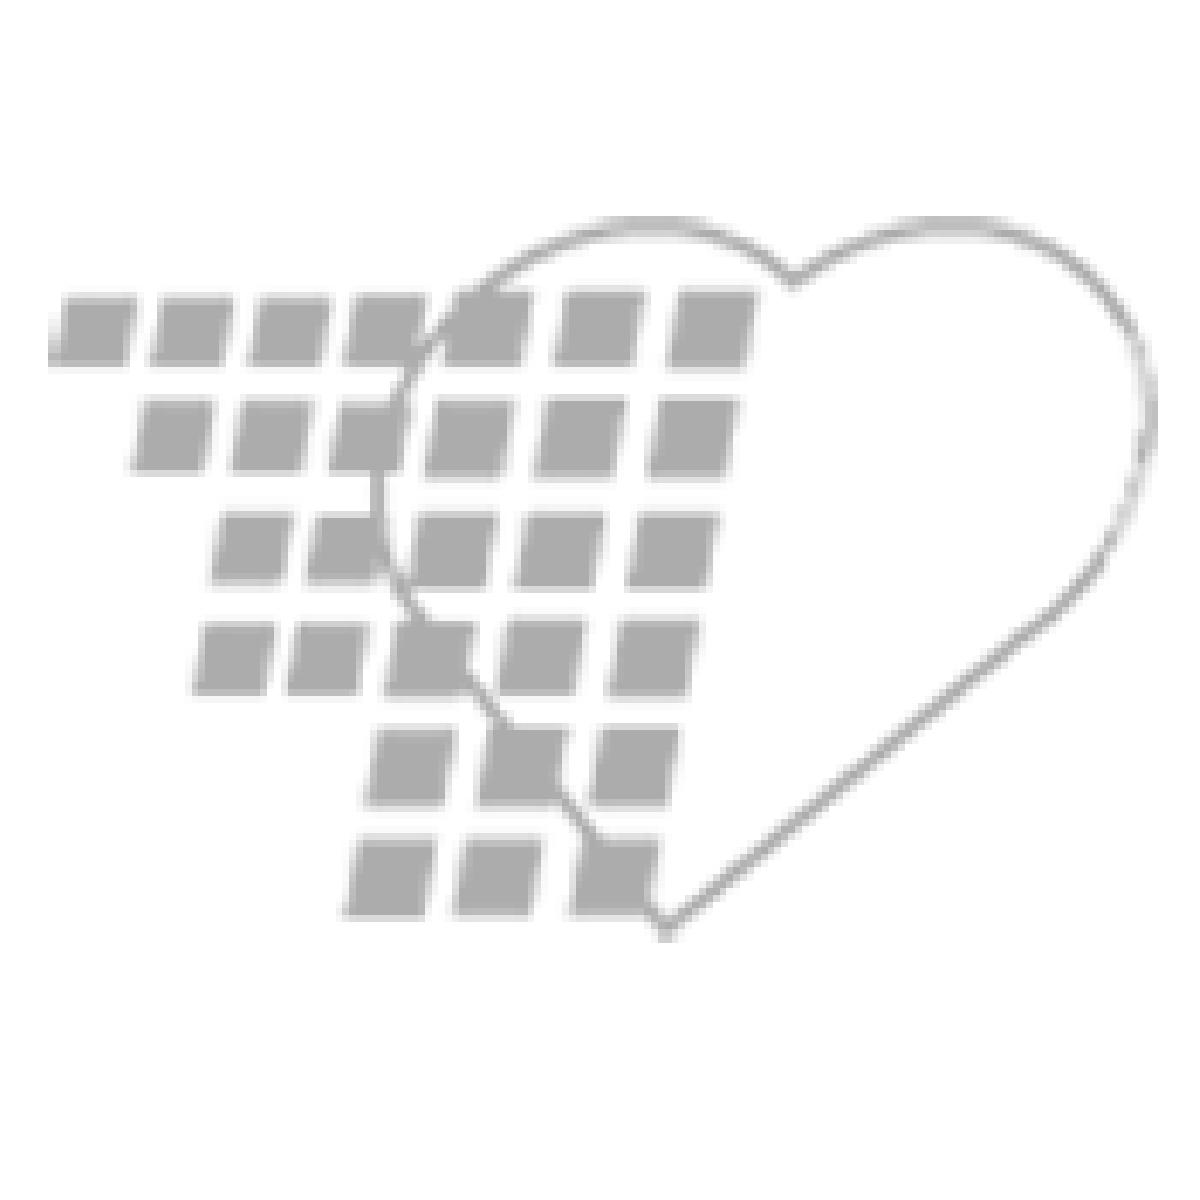 06-93-9027 - Demo Dose® Isosorbid Dinitrat (Isordl) 40 mg - 100/Bottle